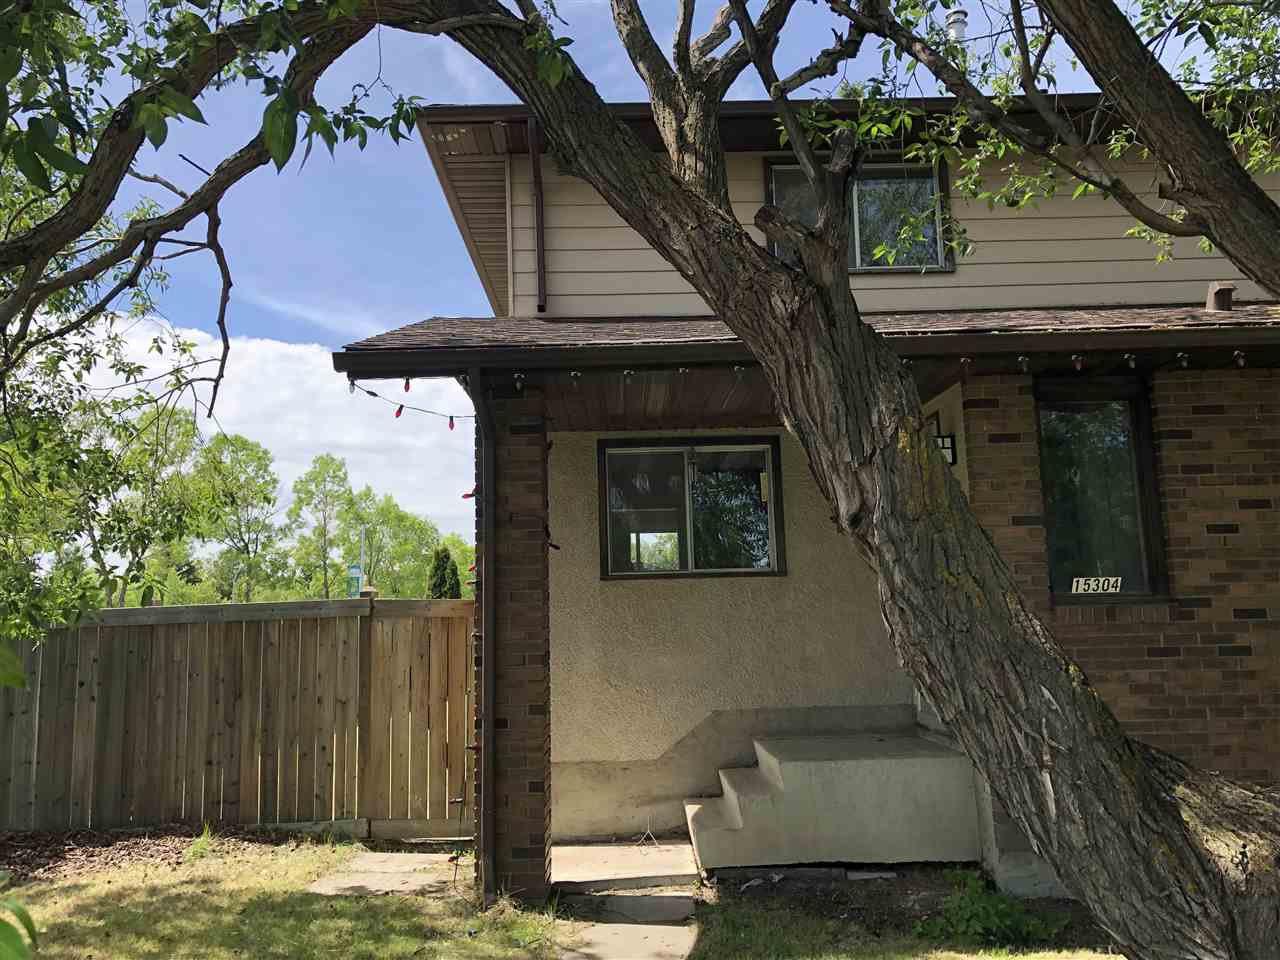 Main Photo: 15304 121 Street in Edmonton: Zone 27 House Half Duplex for sale : MLS®# E4202012